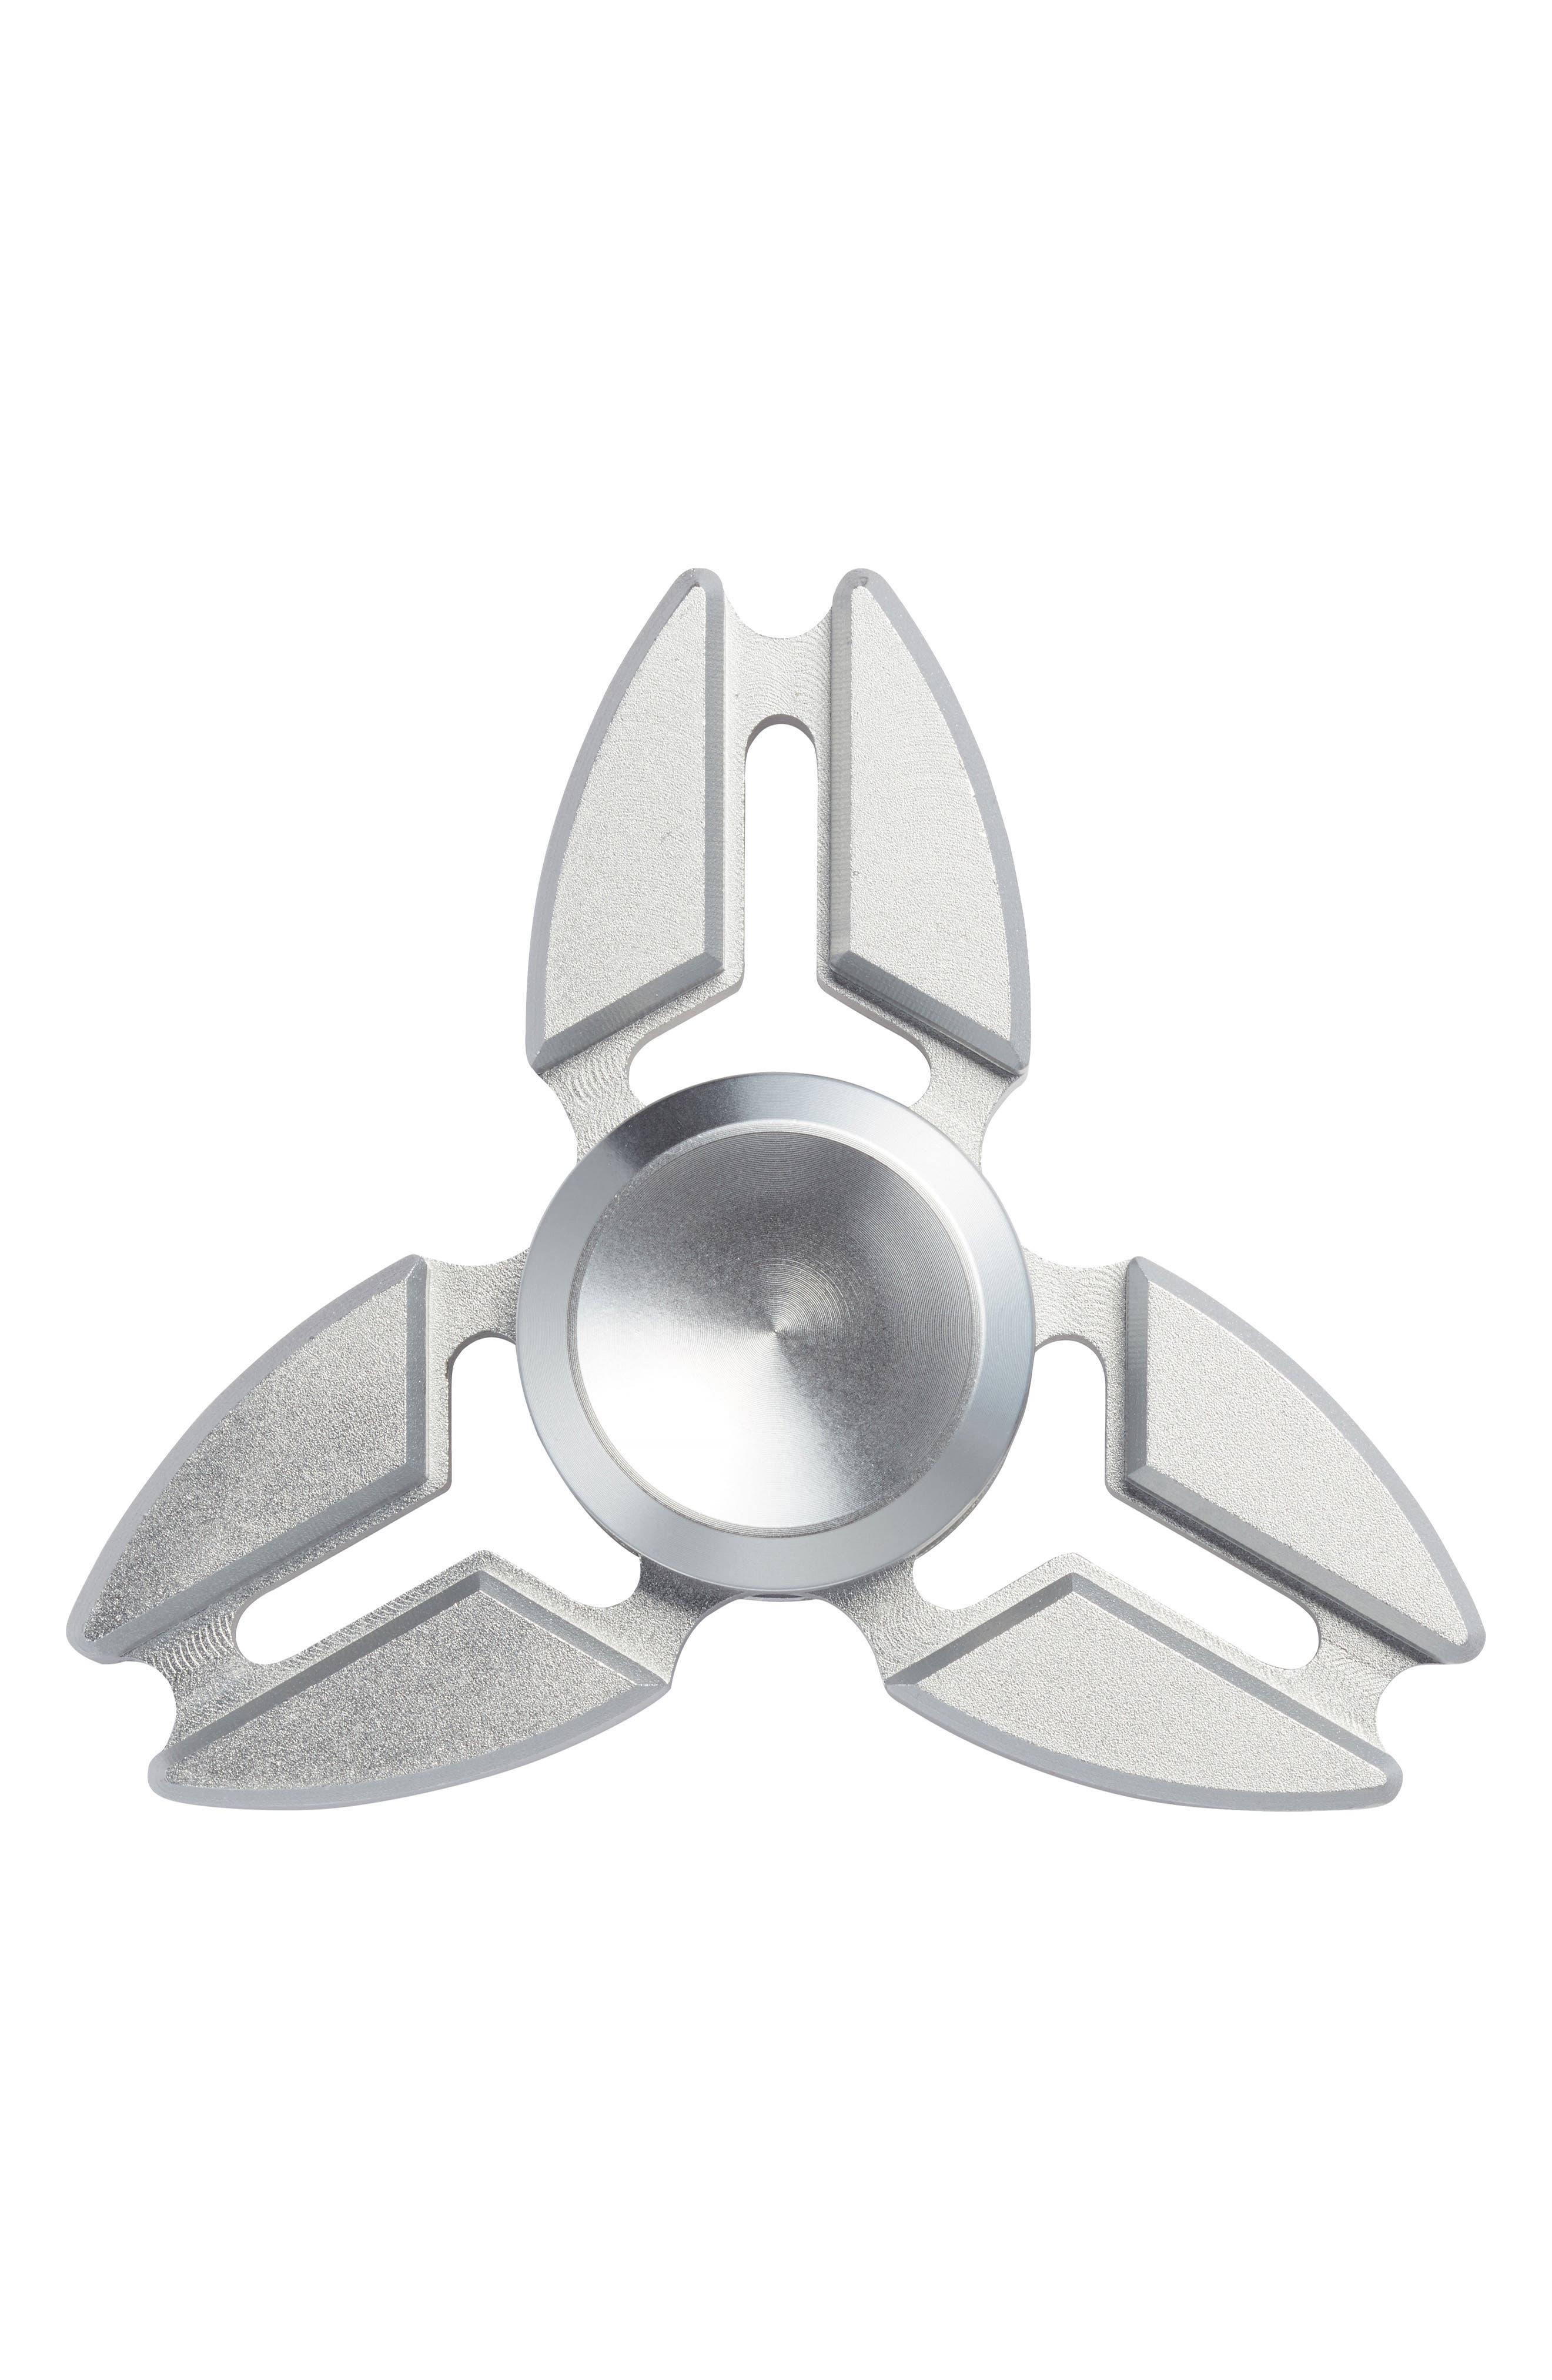 Addictive Fidget Toys Coulee Tri Bar Fidget Spinner